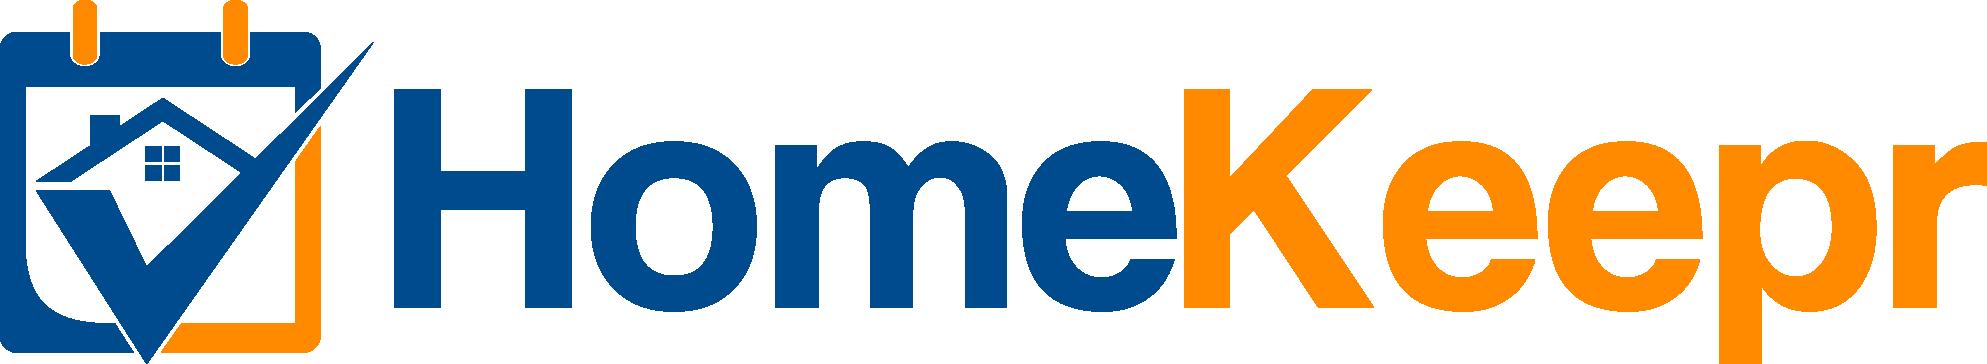 HomeKeepr logo